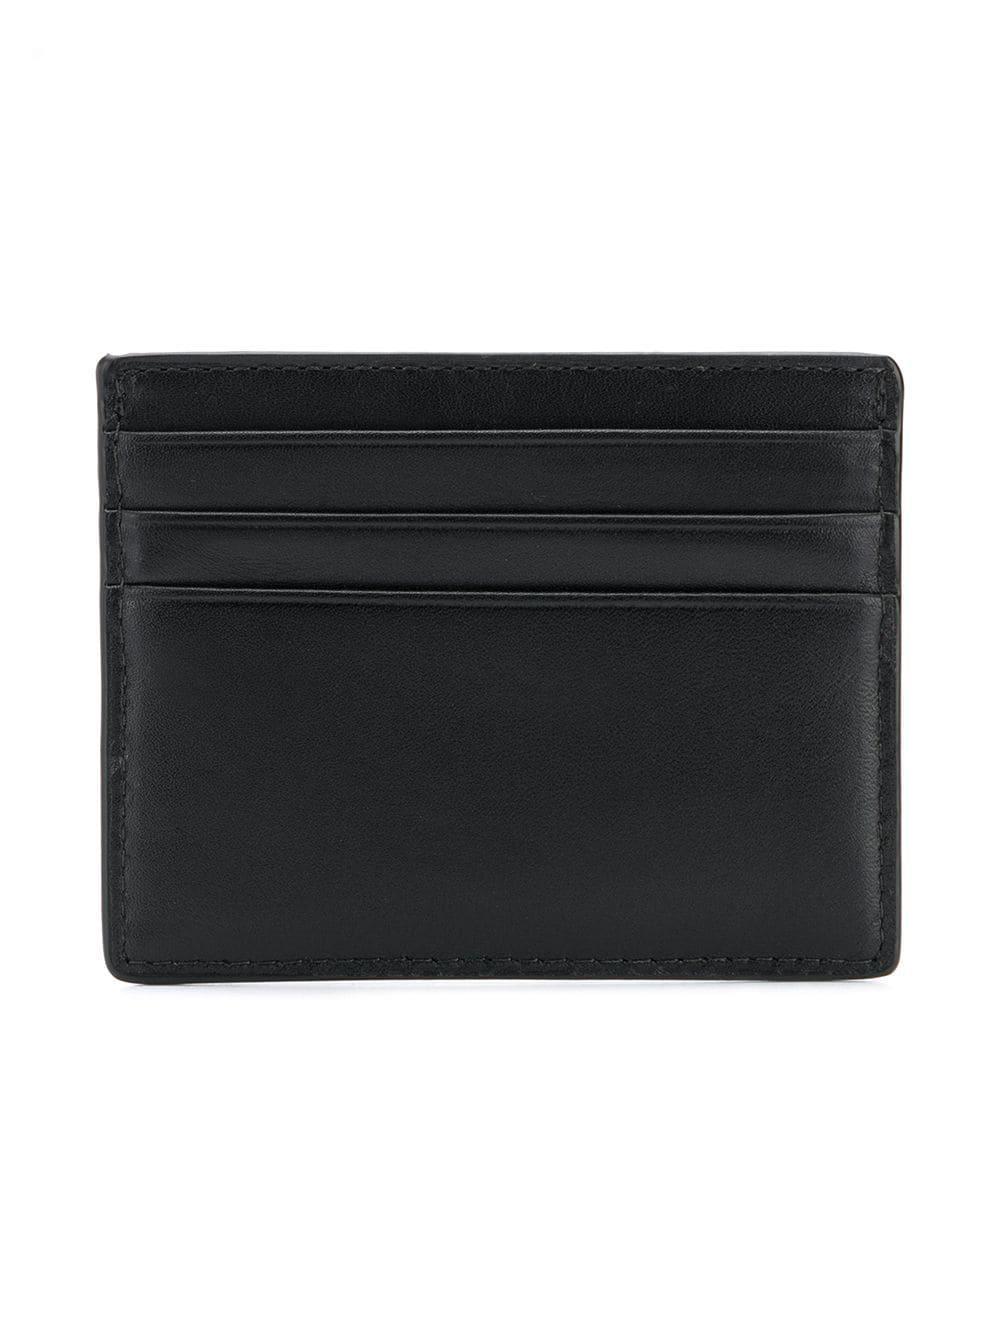 768053dd61bd9 Lyst - Michael Kors Odin Cardholder in Black for Men